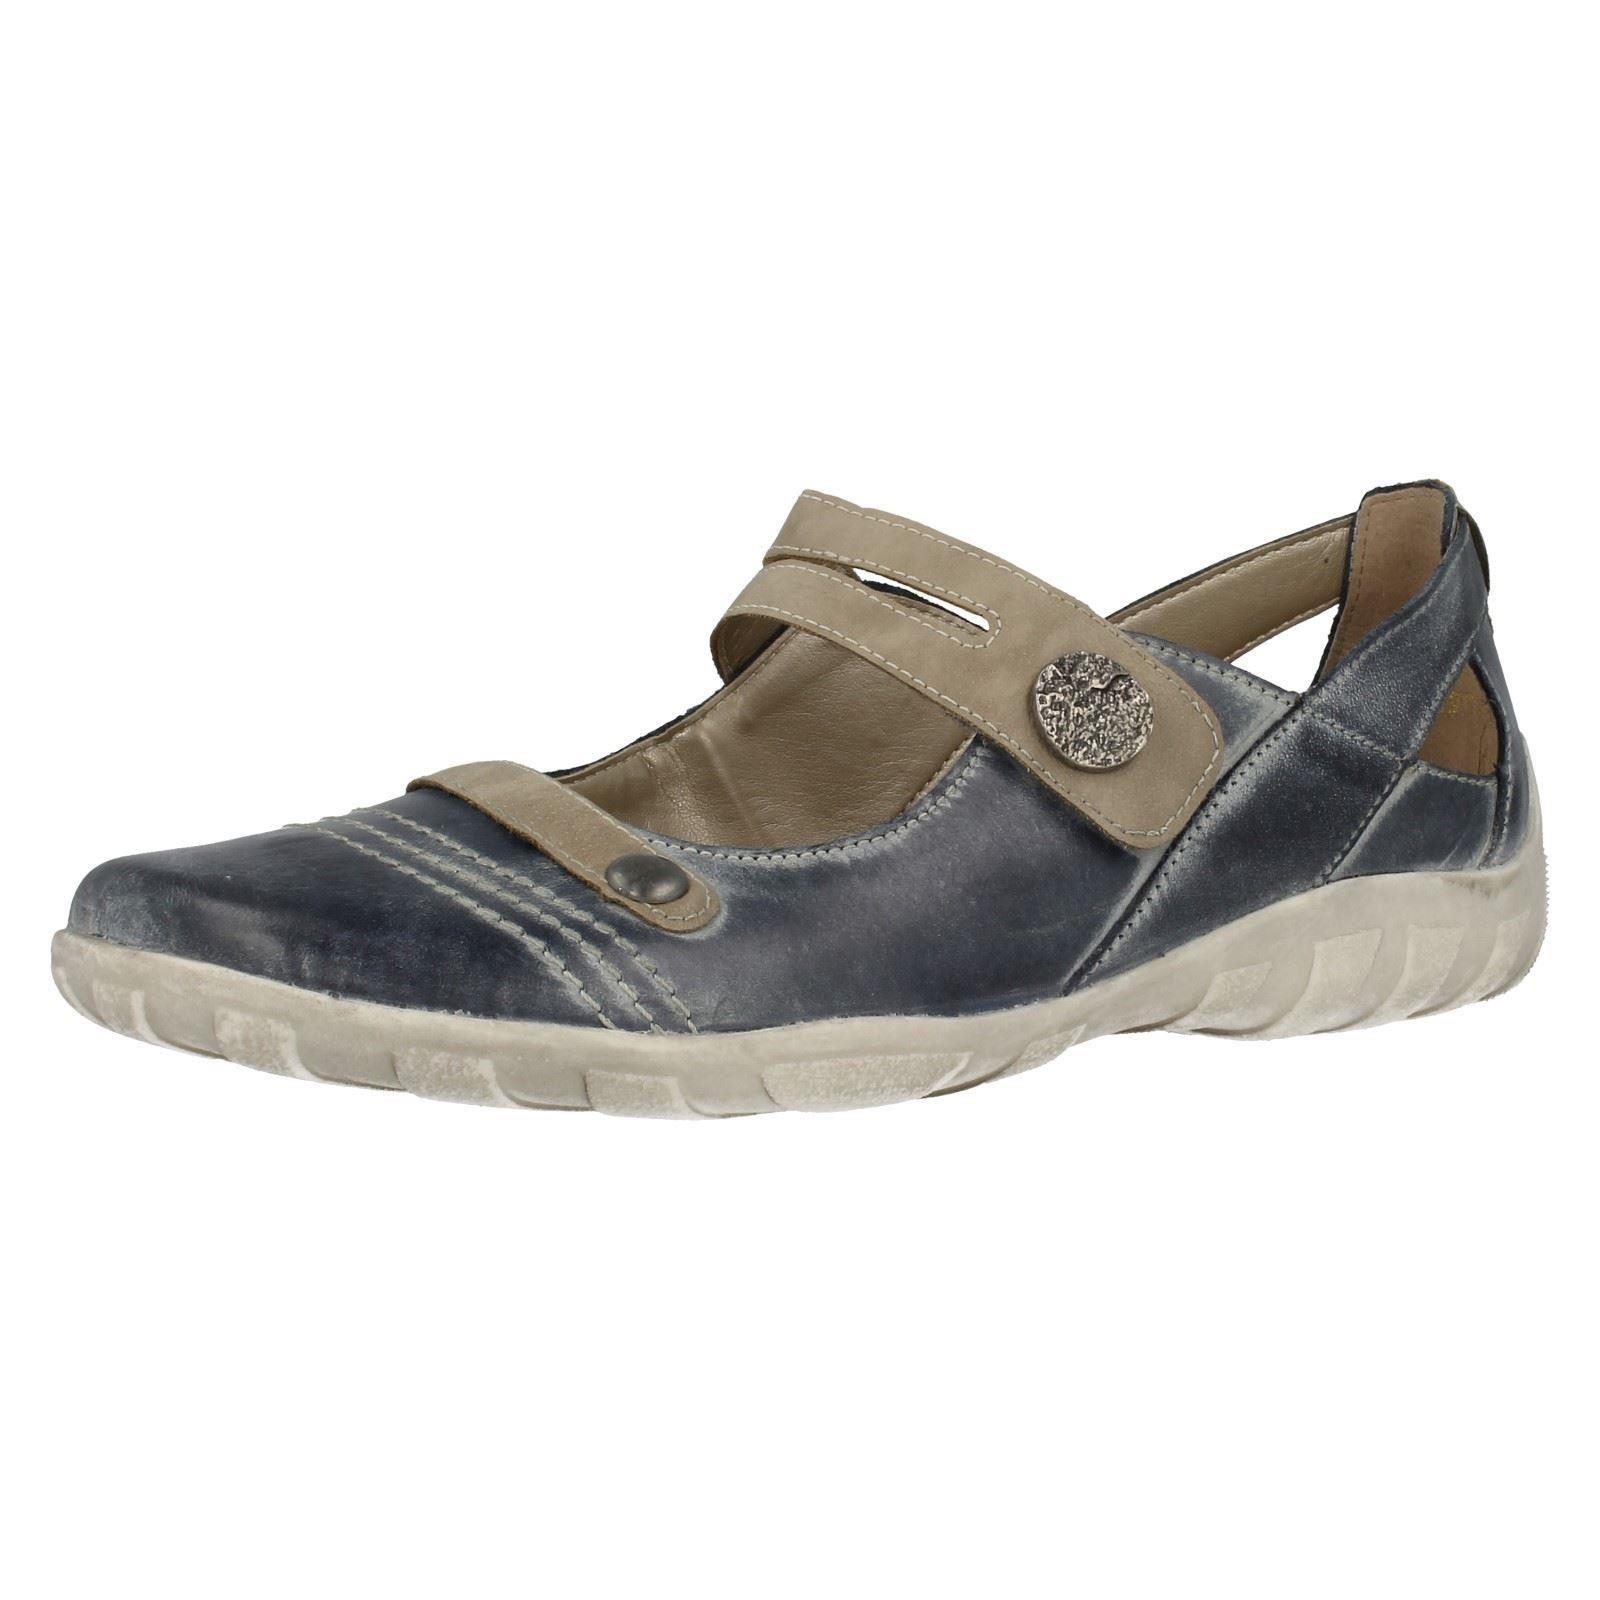 ladies remonte shoes 39 r3418 39 ebay. Black Bedroom Furniture Sets. Home Design Ideas